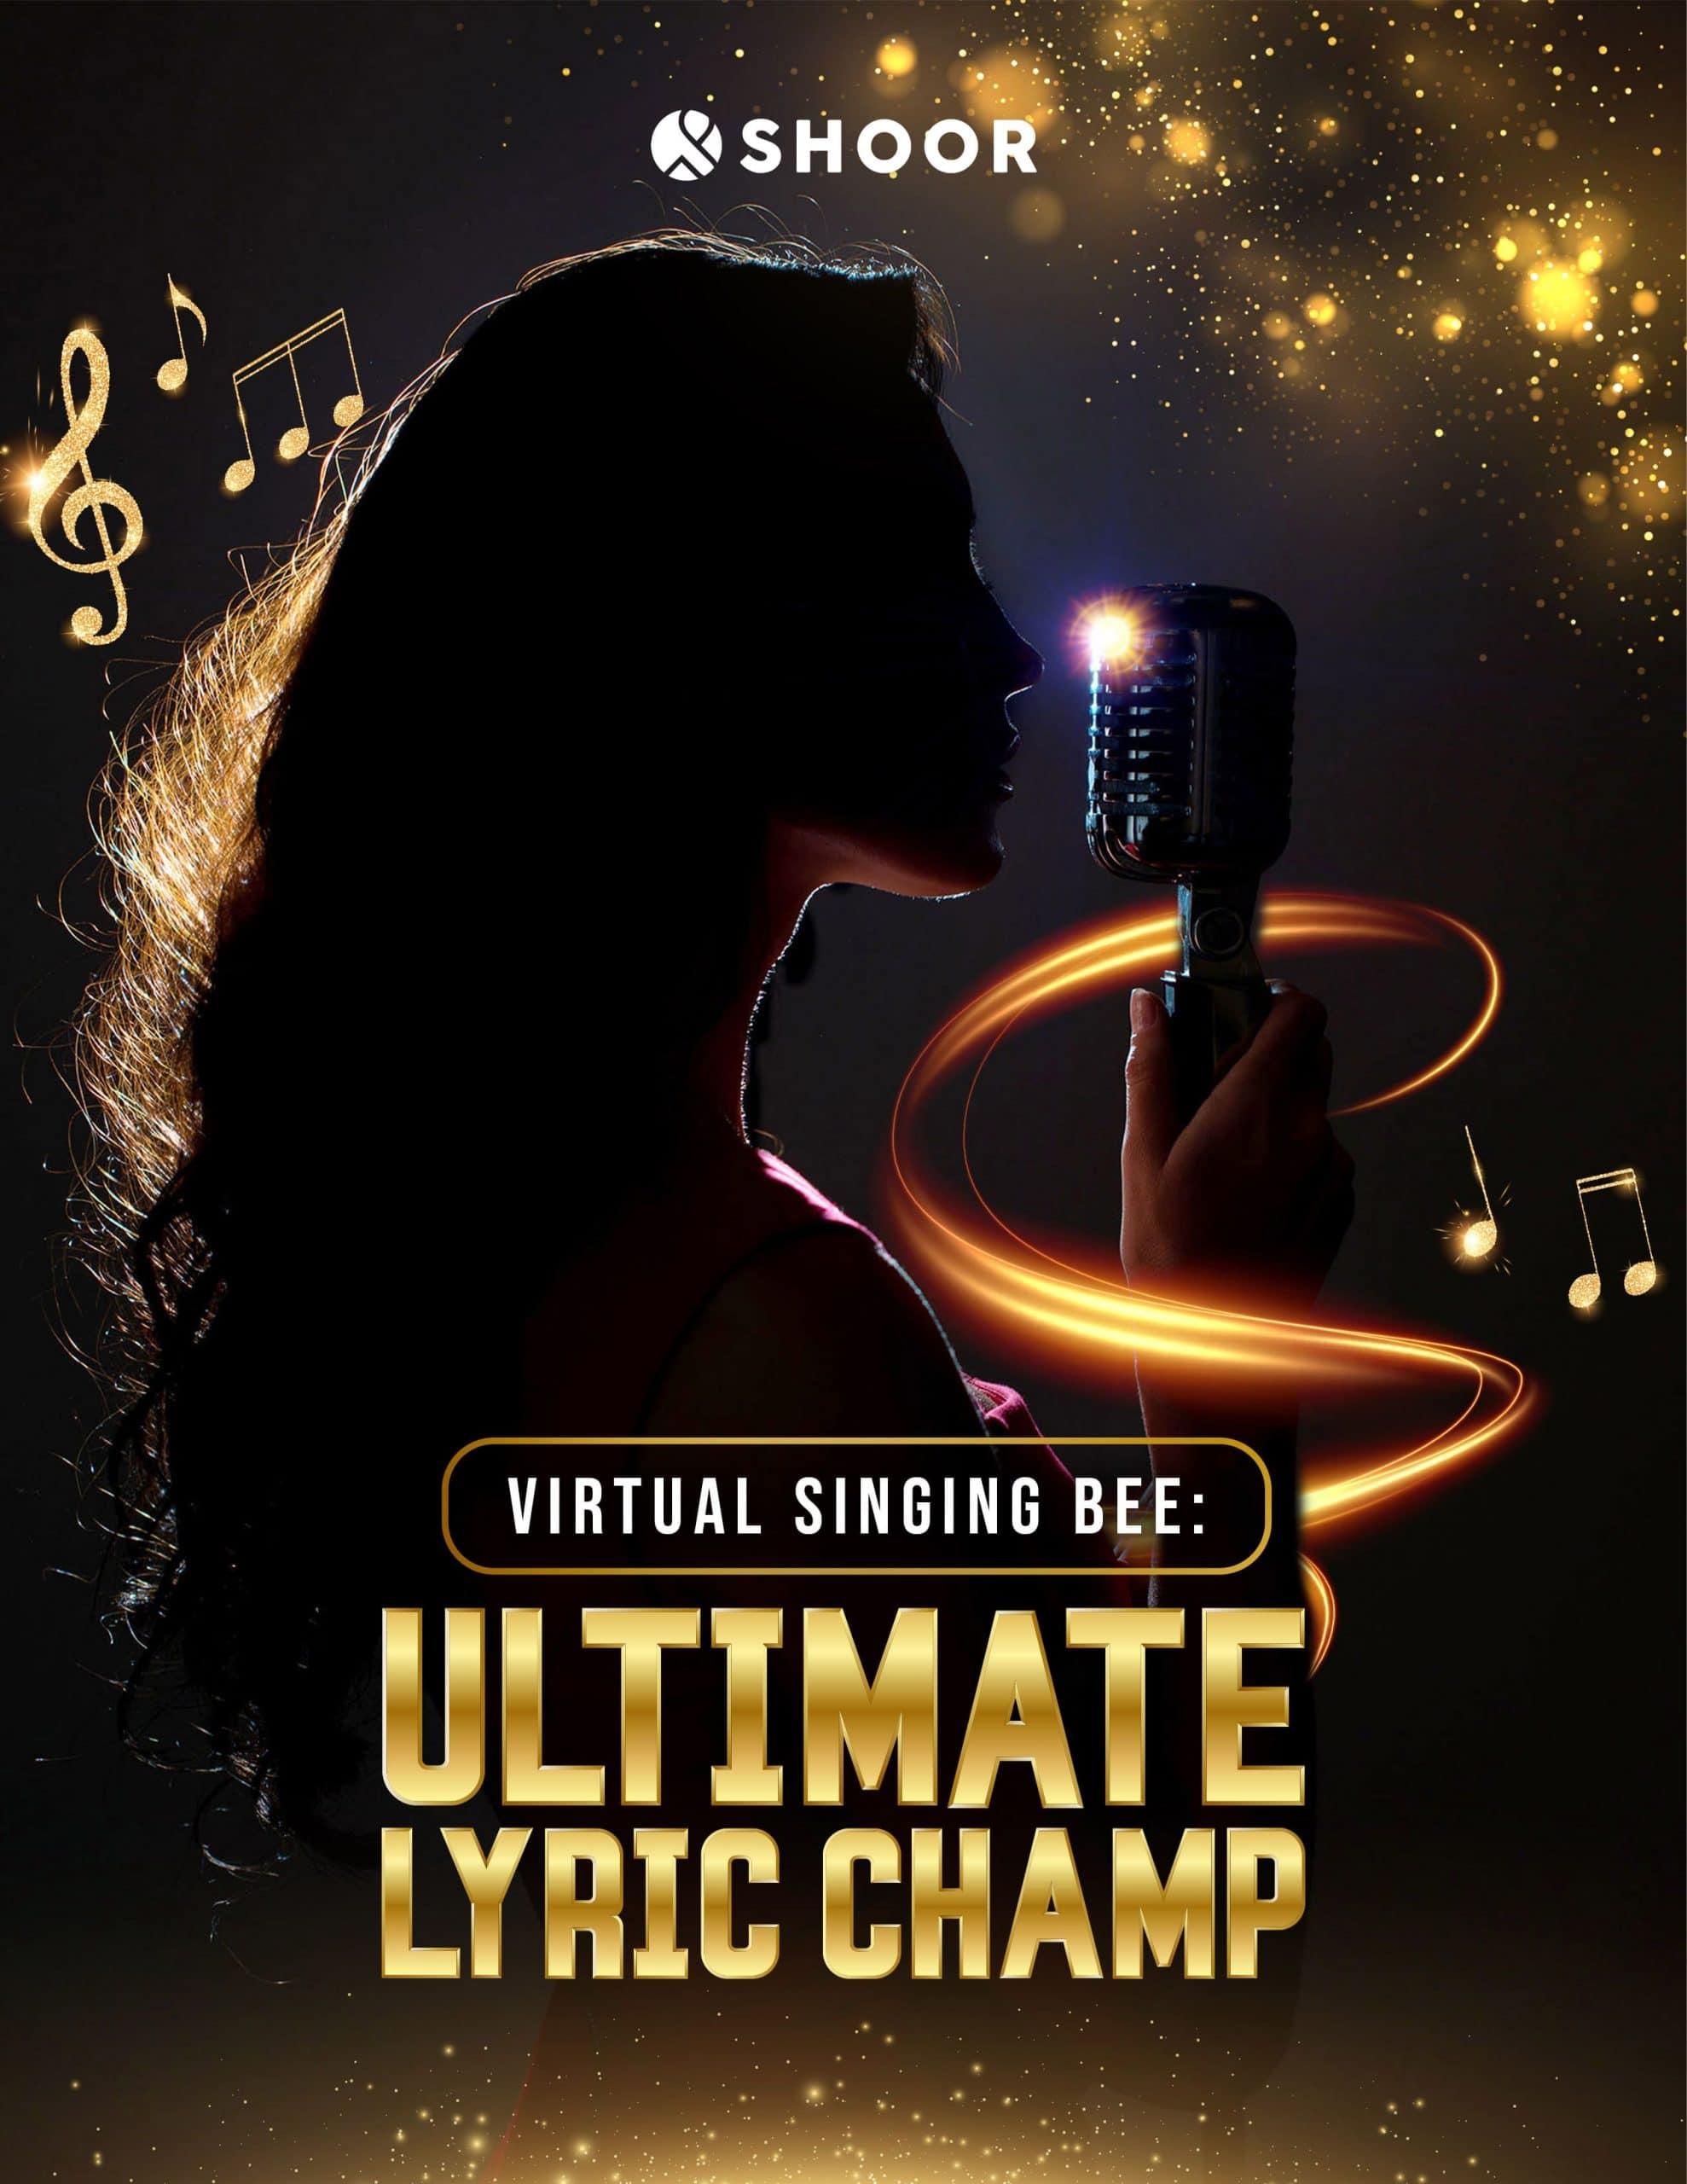 Virtual Singing Bee: Ultimate Lyric Champ